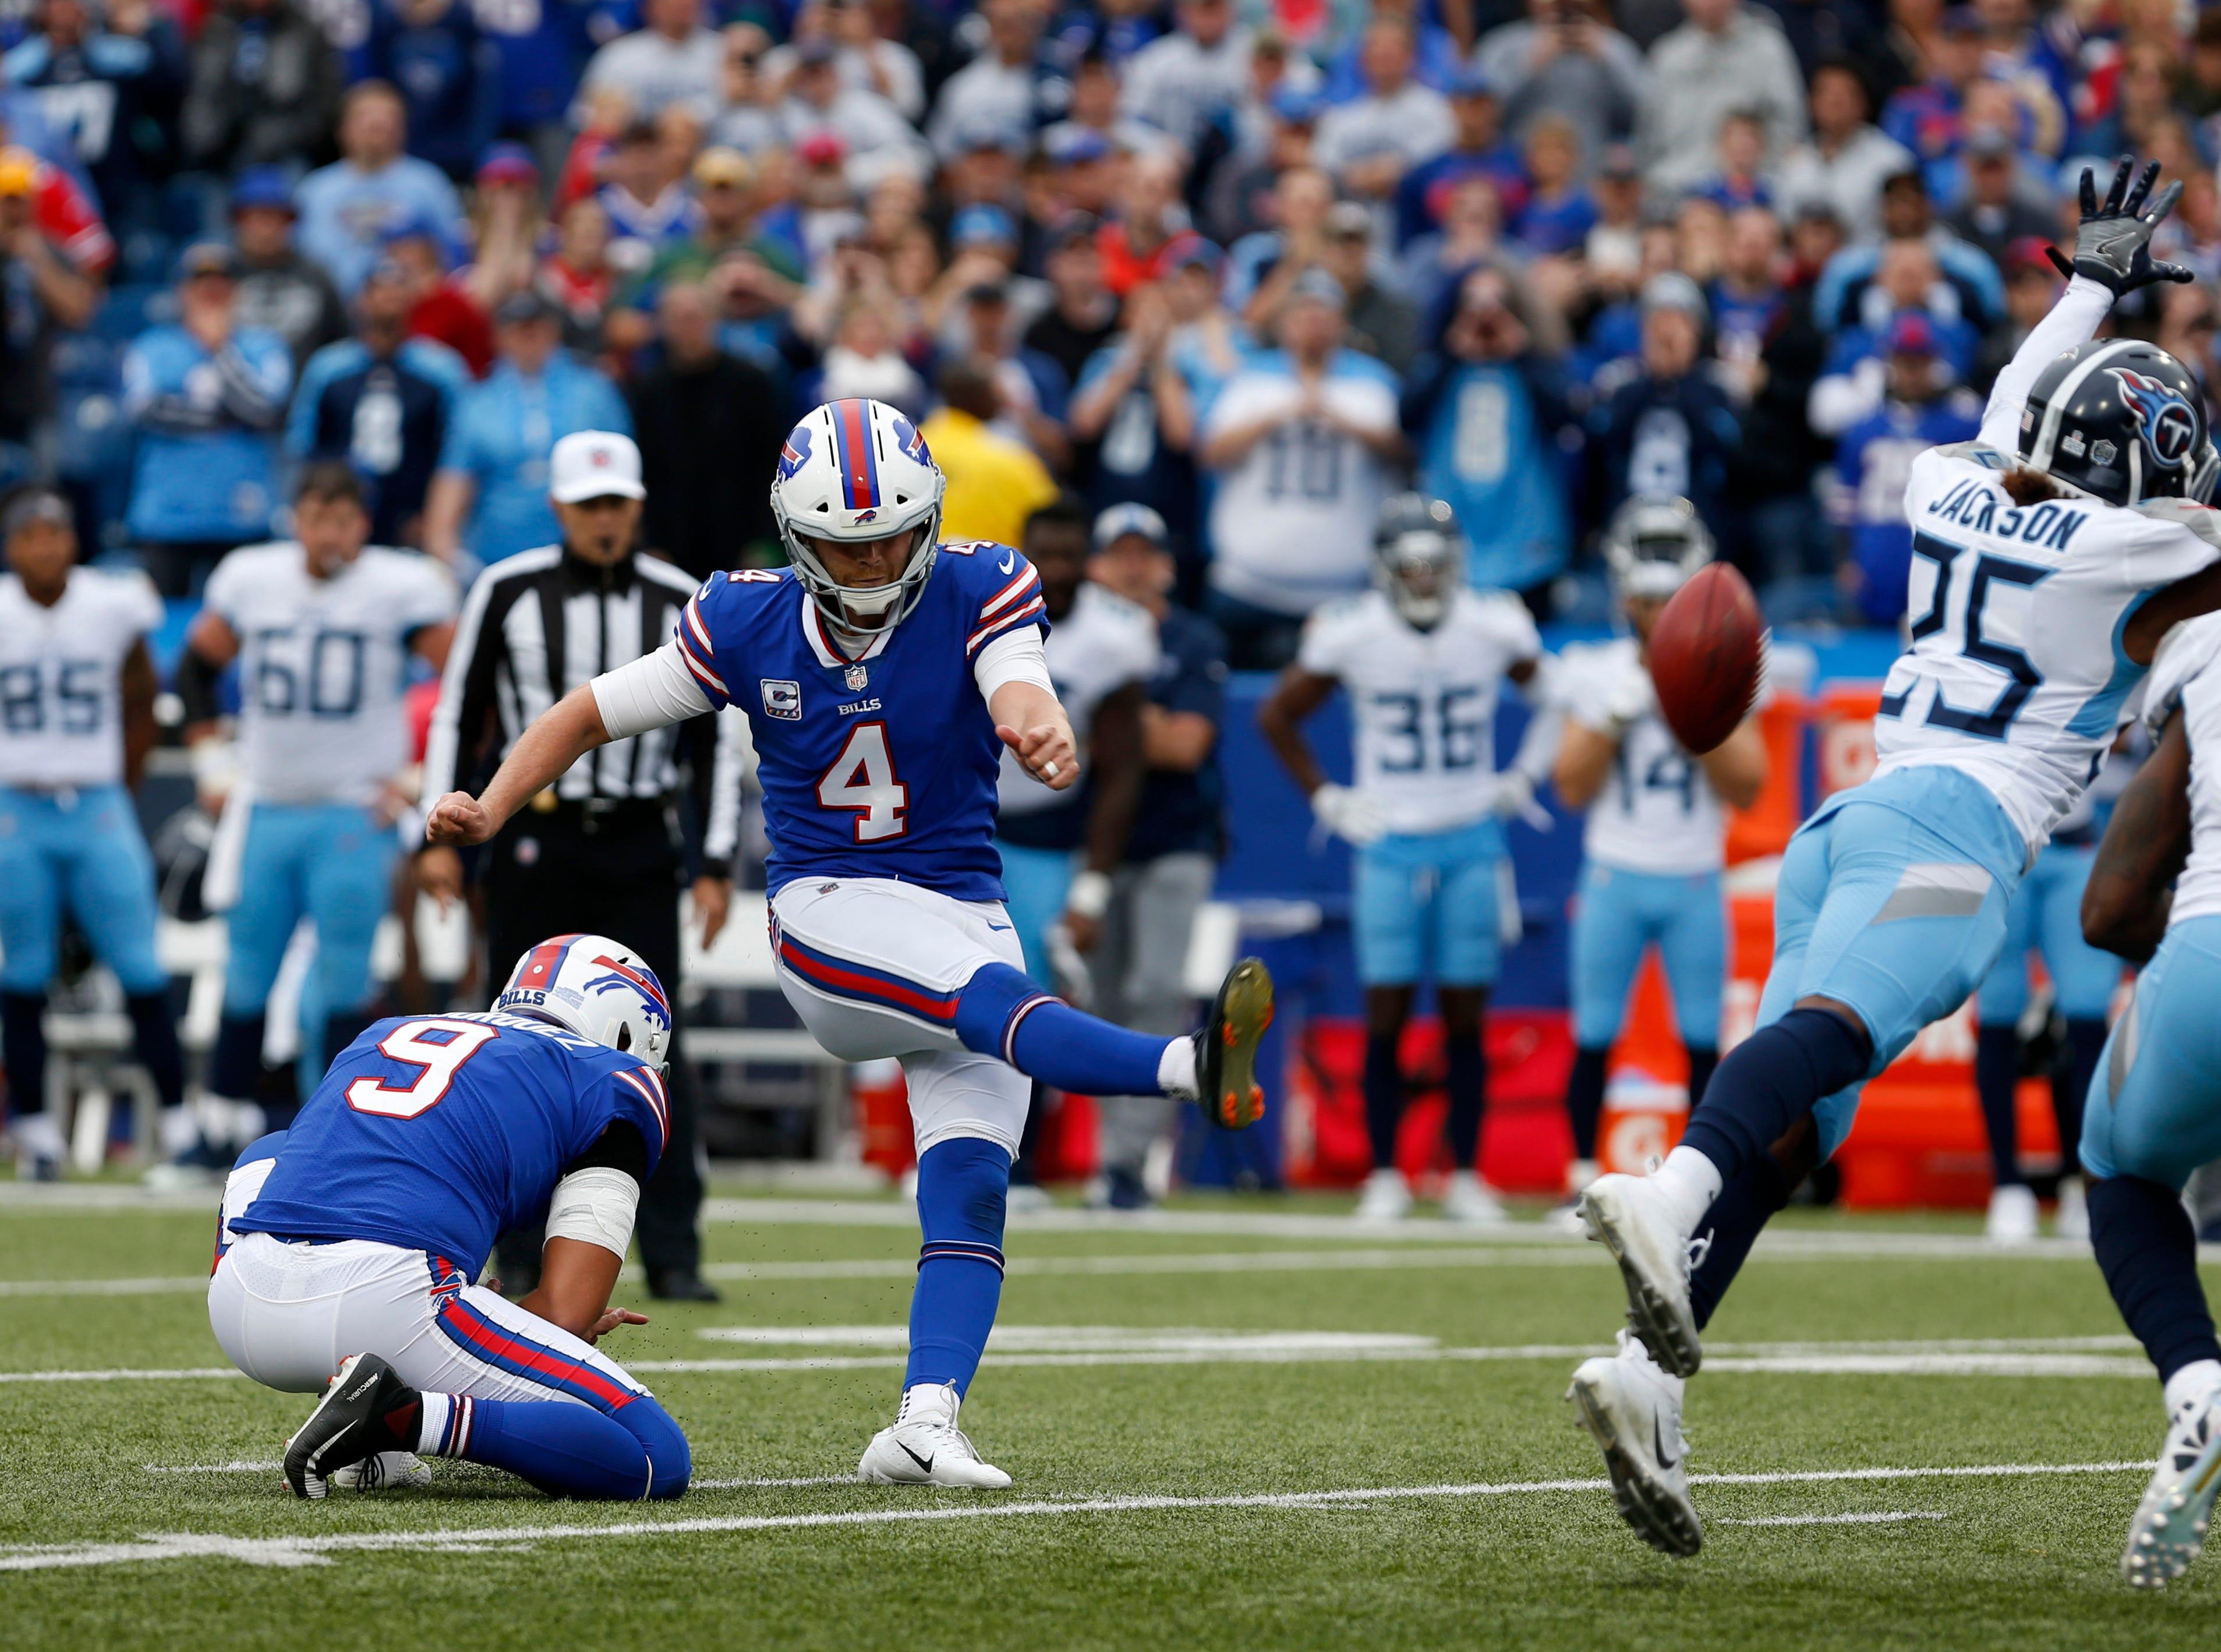 Oct 7, 2018; Orchard Park, NY, USA; Buffalo Bills kicker Stephen Hauschka (4) kicks the game winning field goal against the Tennessee Titans during the second half at New Era Field.